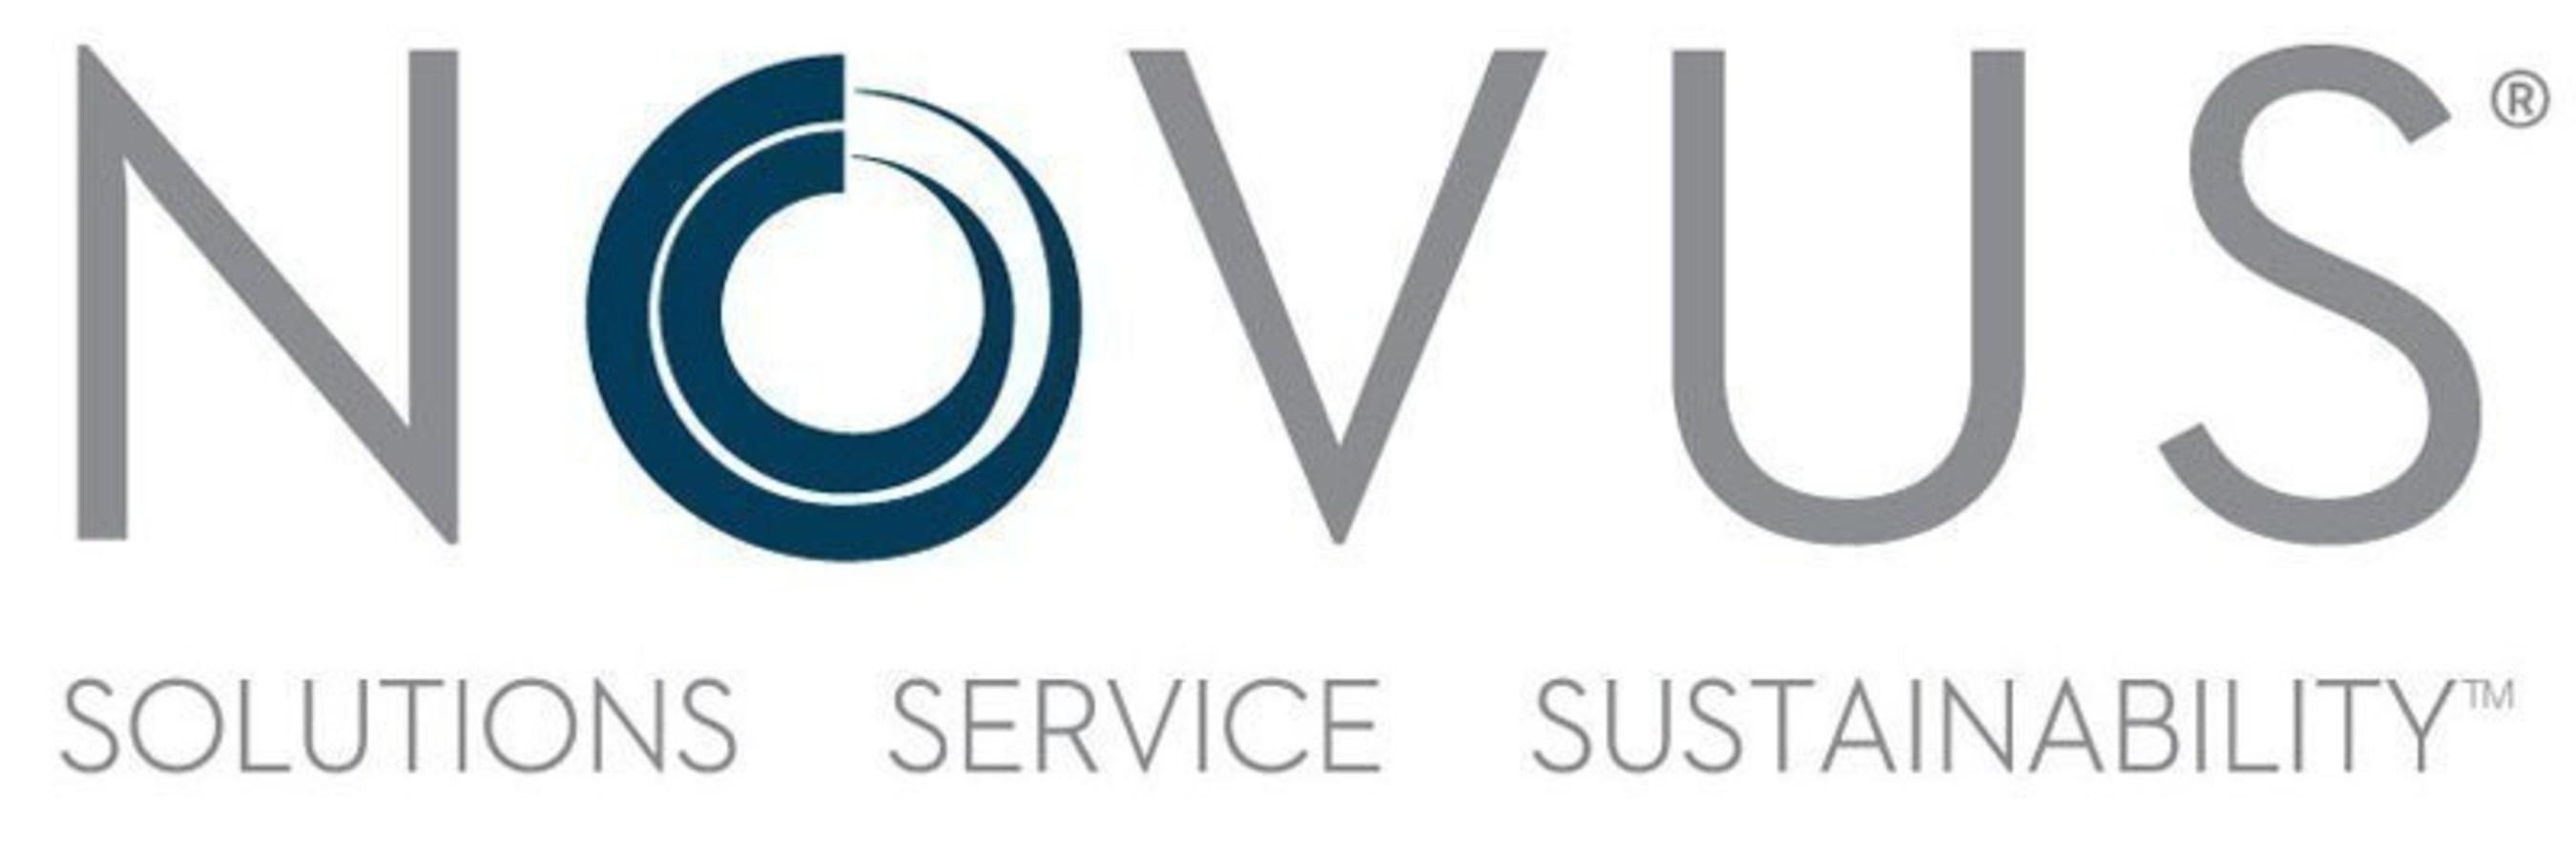 Novus International to Present New Research at JAM 2015